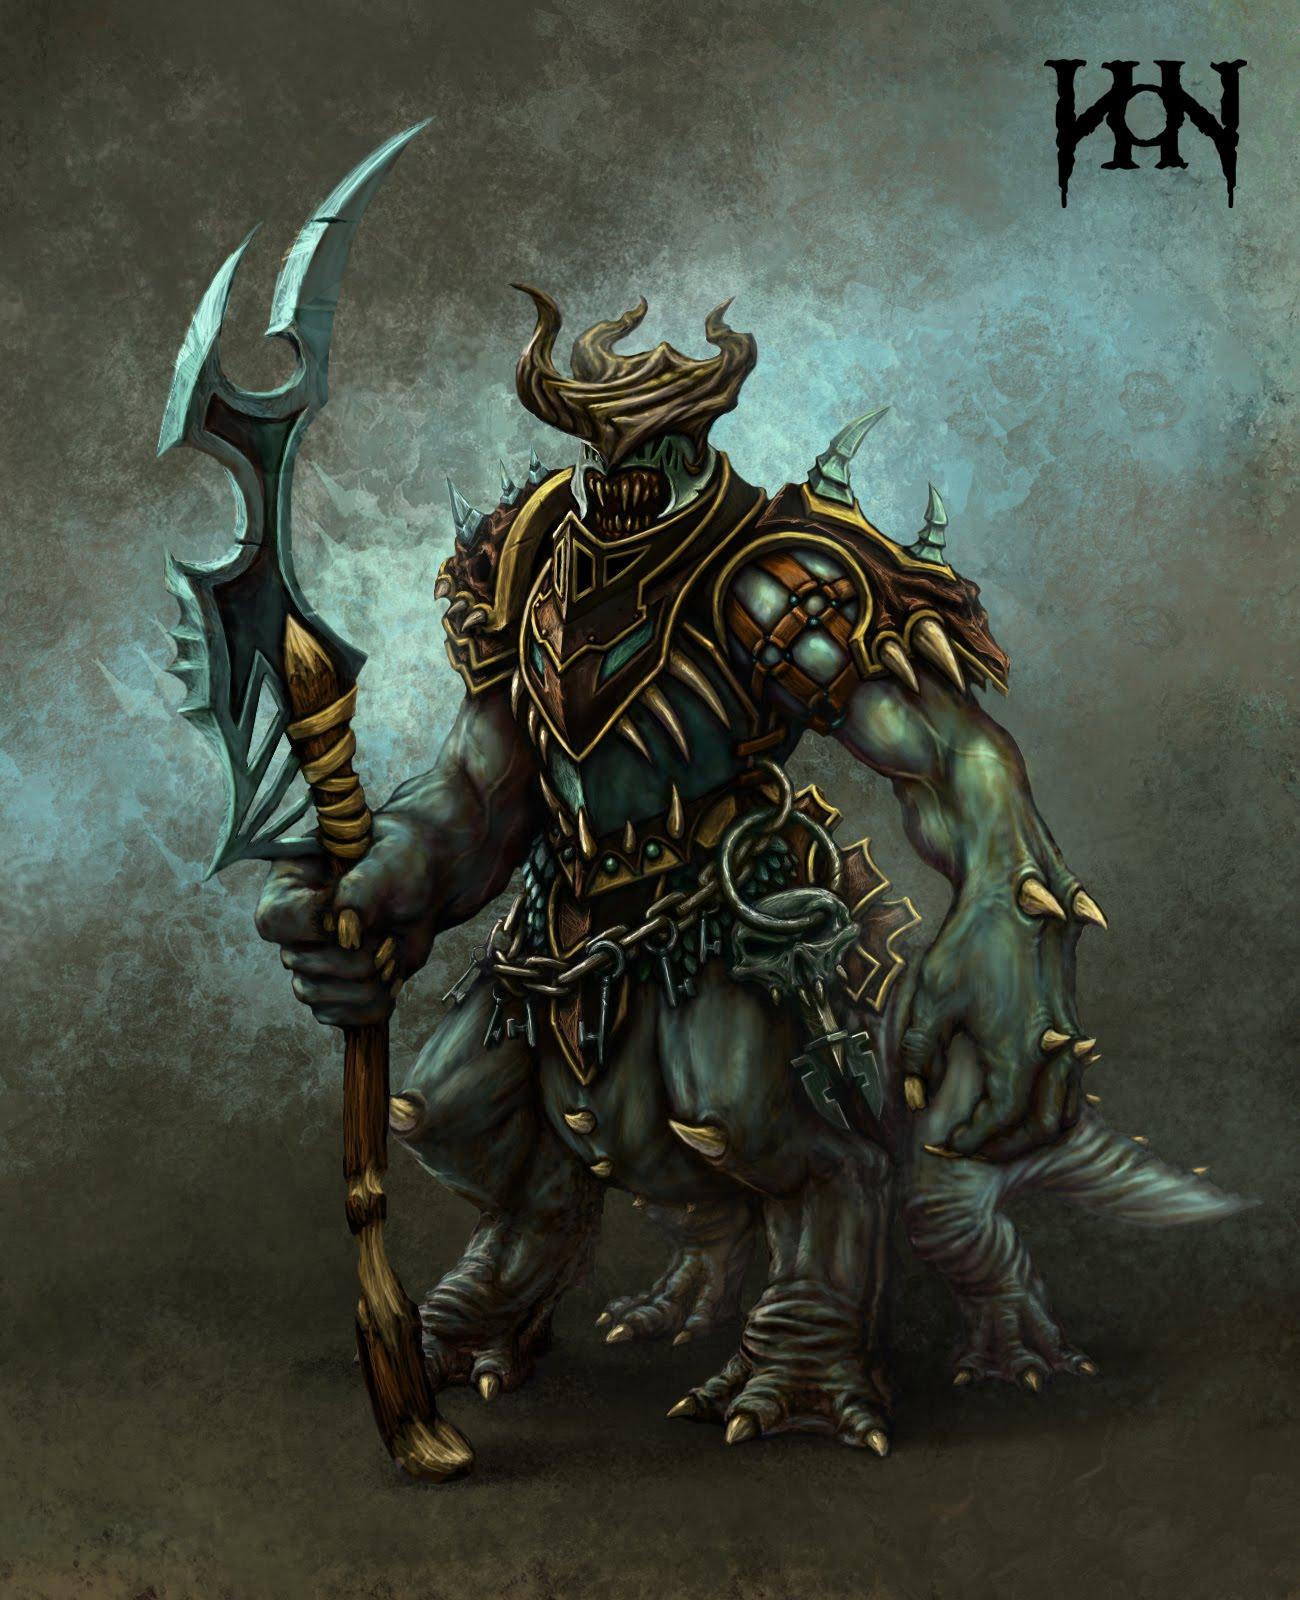 http://3.bp.blogspot.com/_vLNZef6W0aQ/SxKj6bedR7I/AAAAAAAAEZA/cAvyTjsaiTo/s1600/dungeon_master.jpg